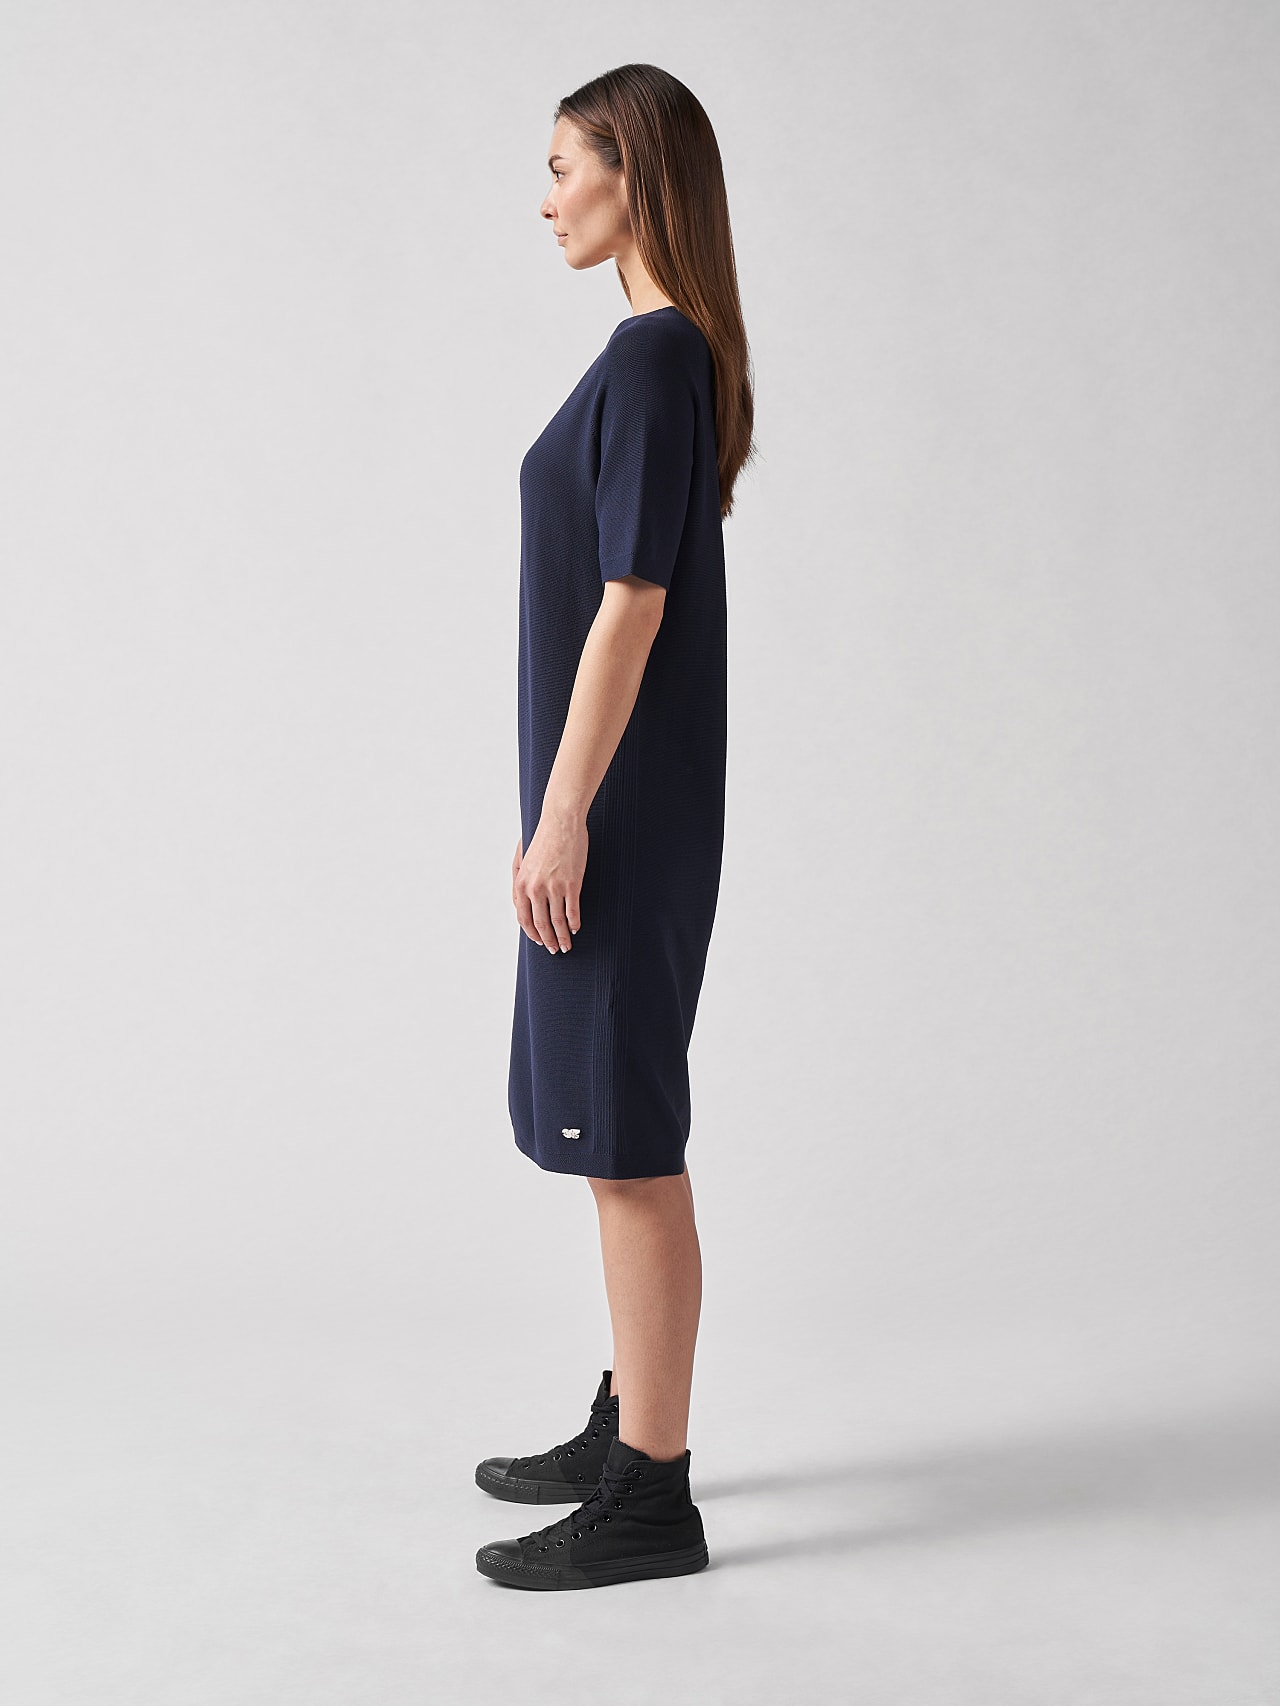 FZORF V1.Y5.01 Seamless Knit Dress navy Front Alpha Tauri